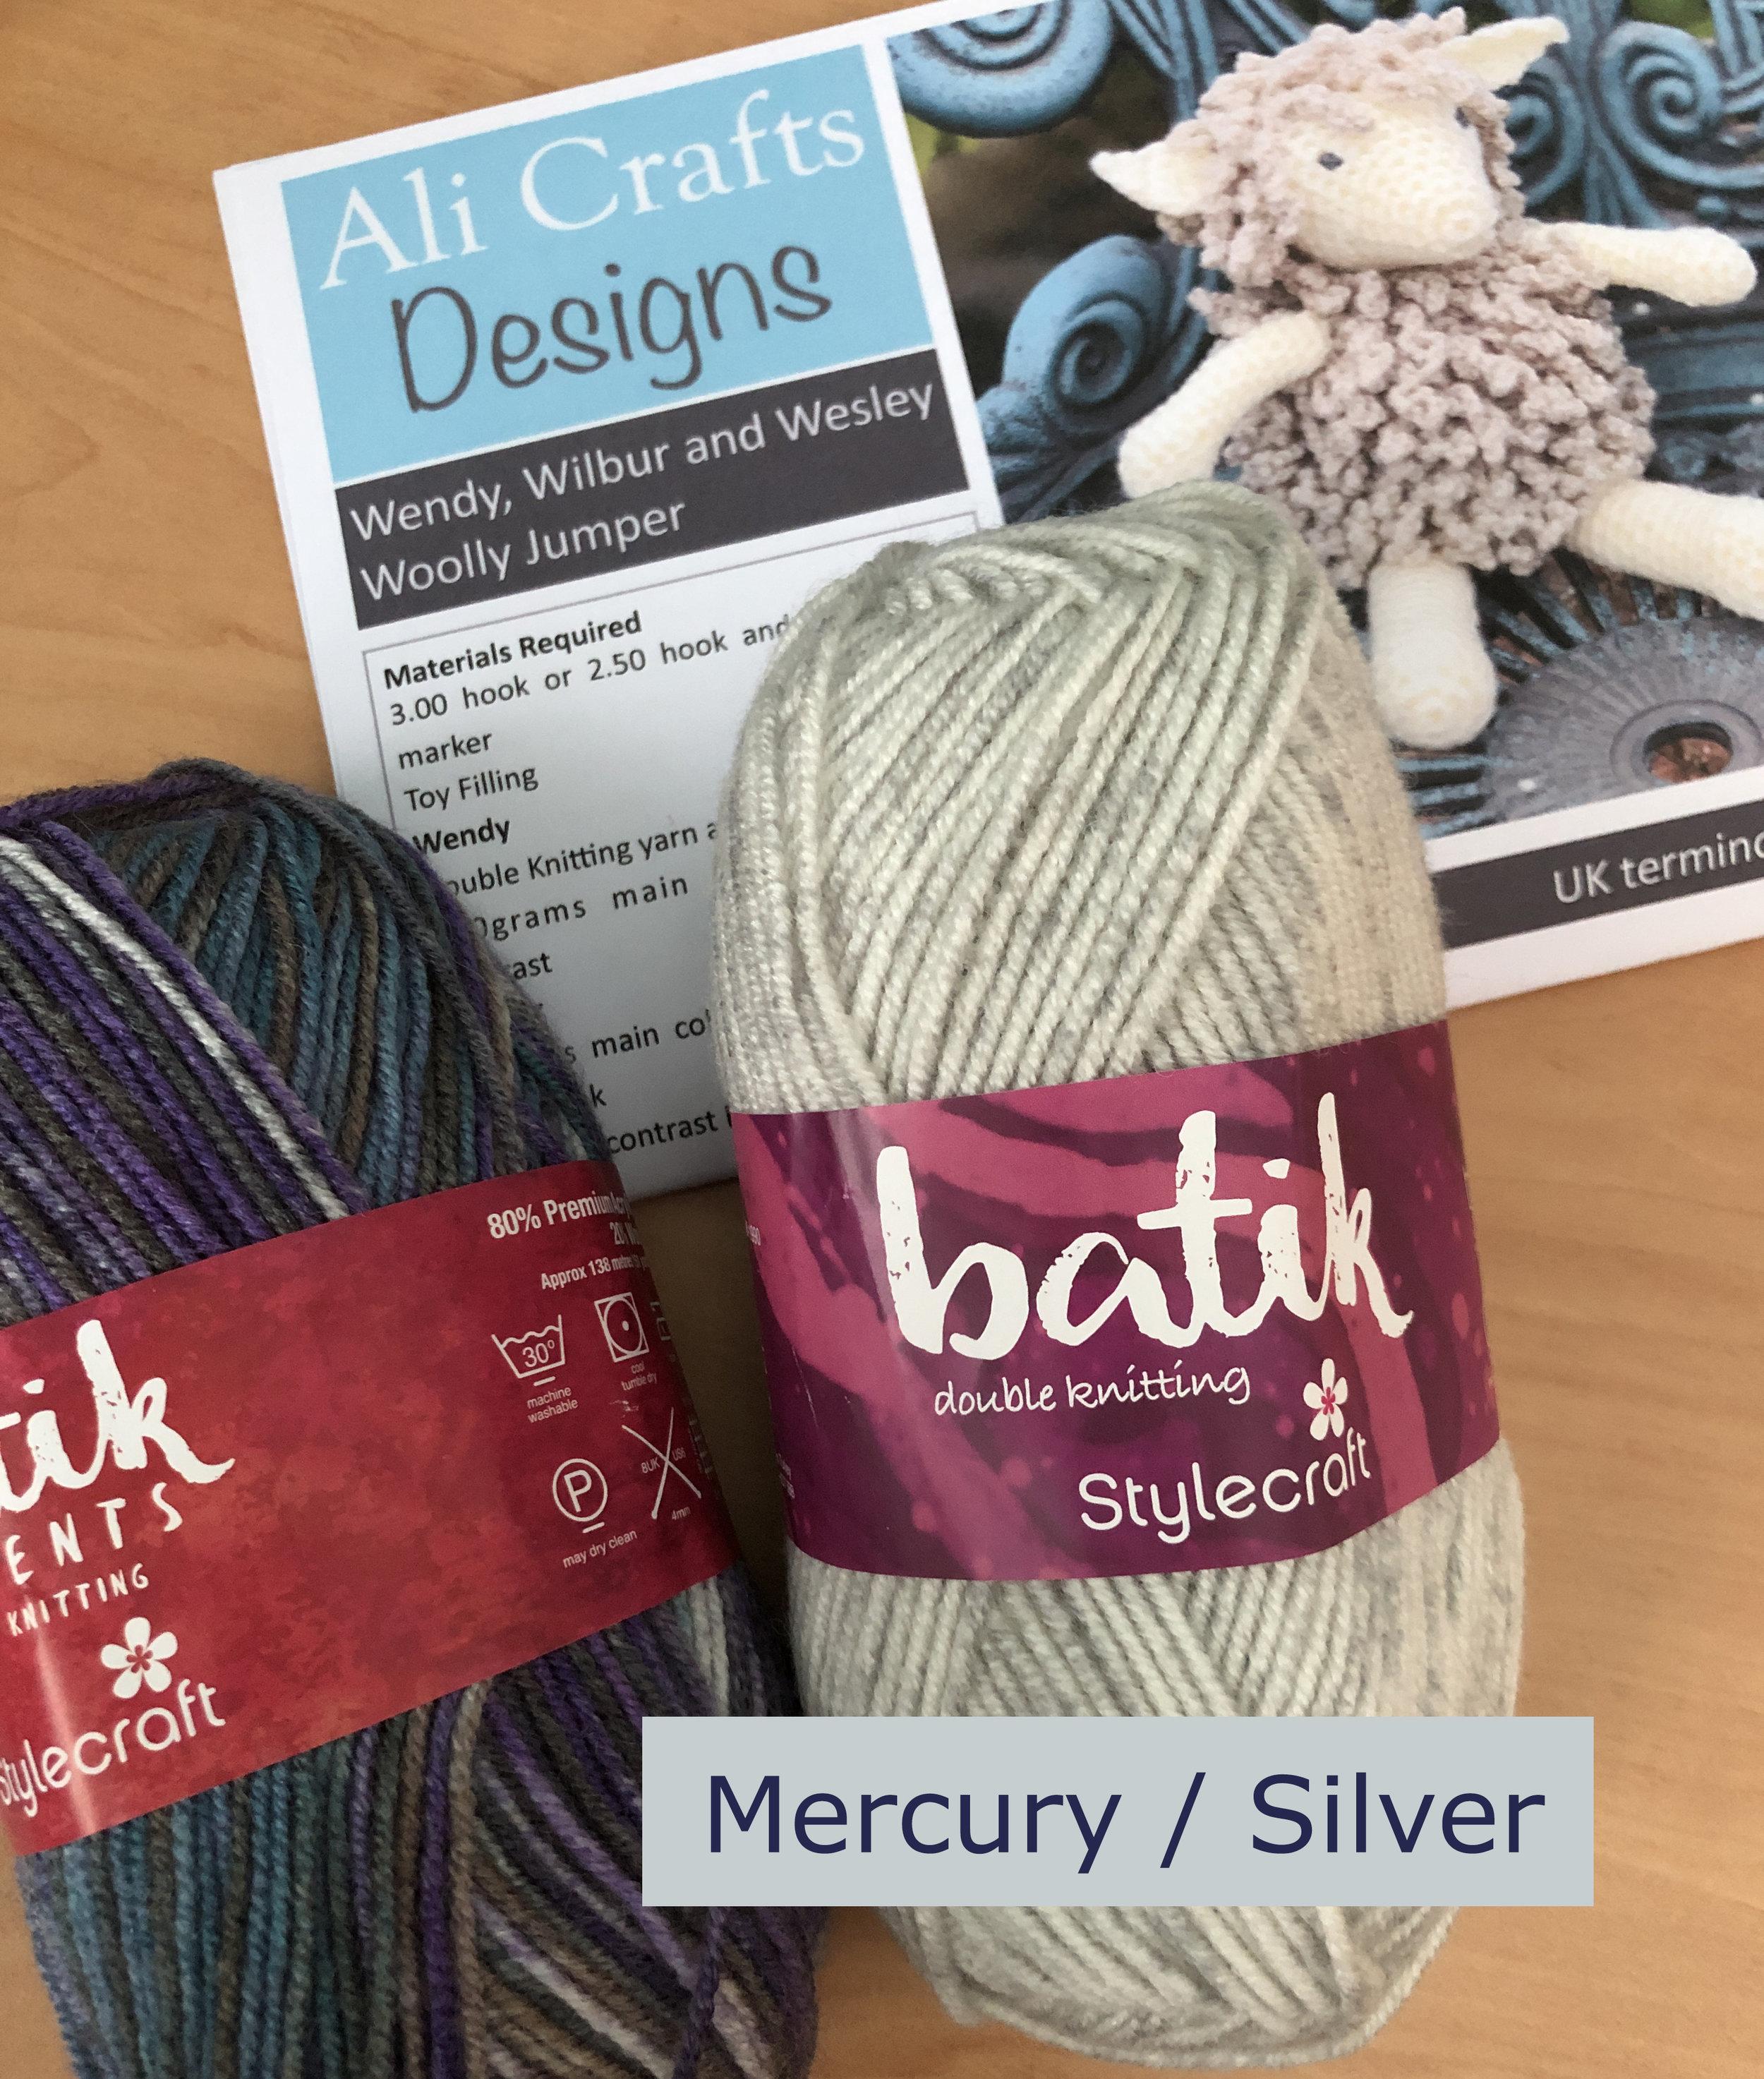 Wendy sheep crochet kit